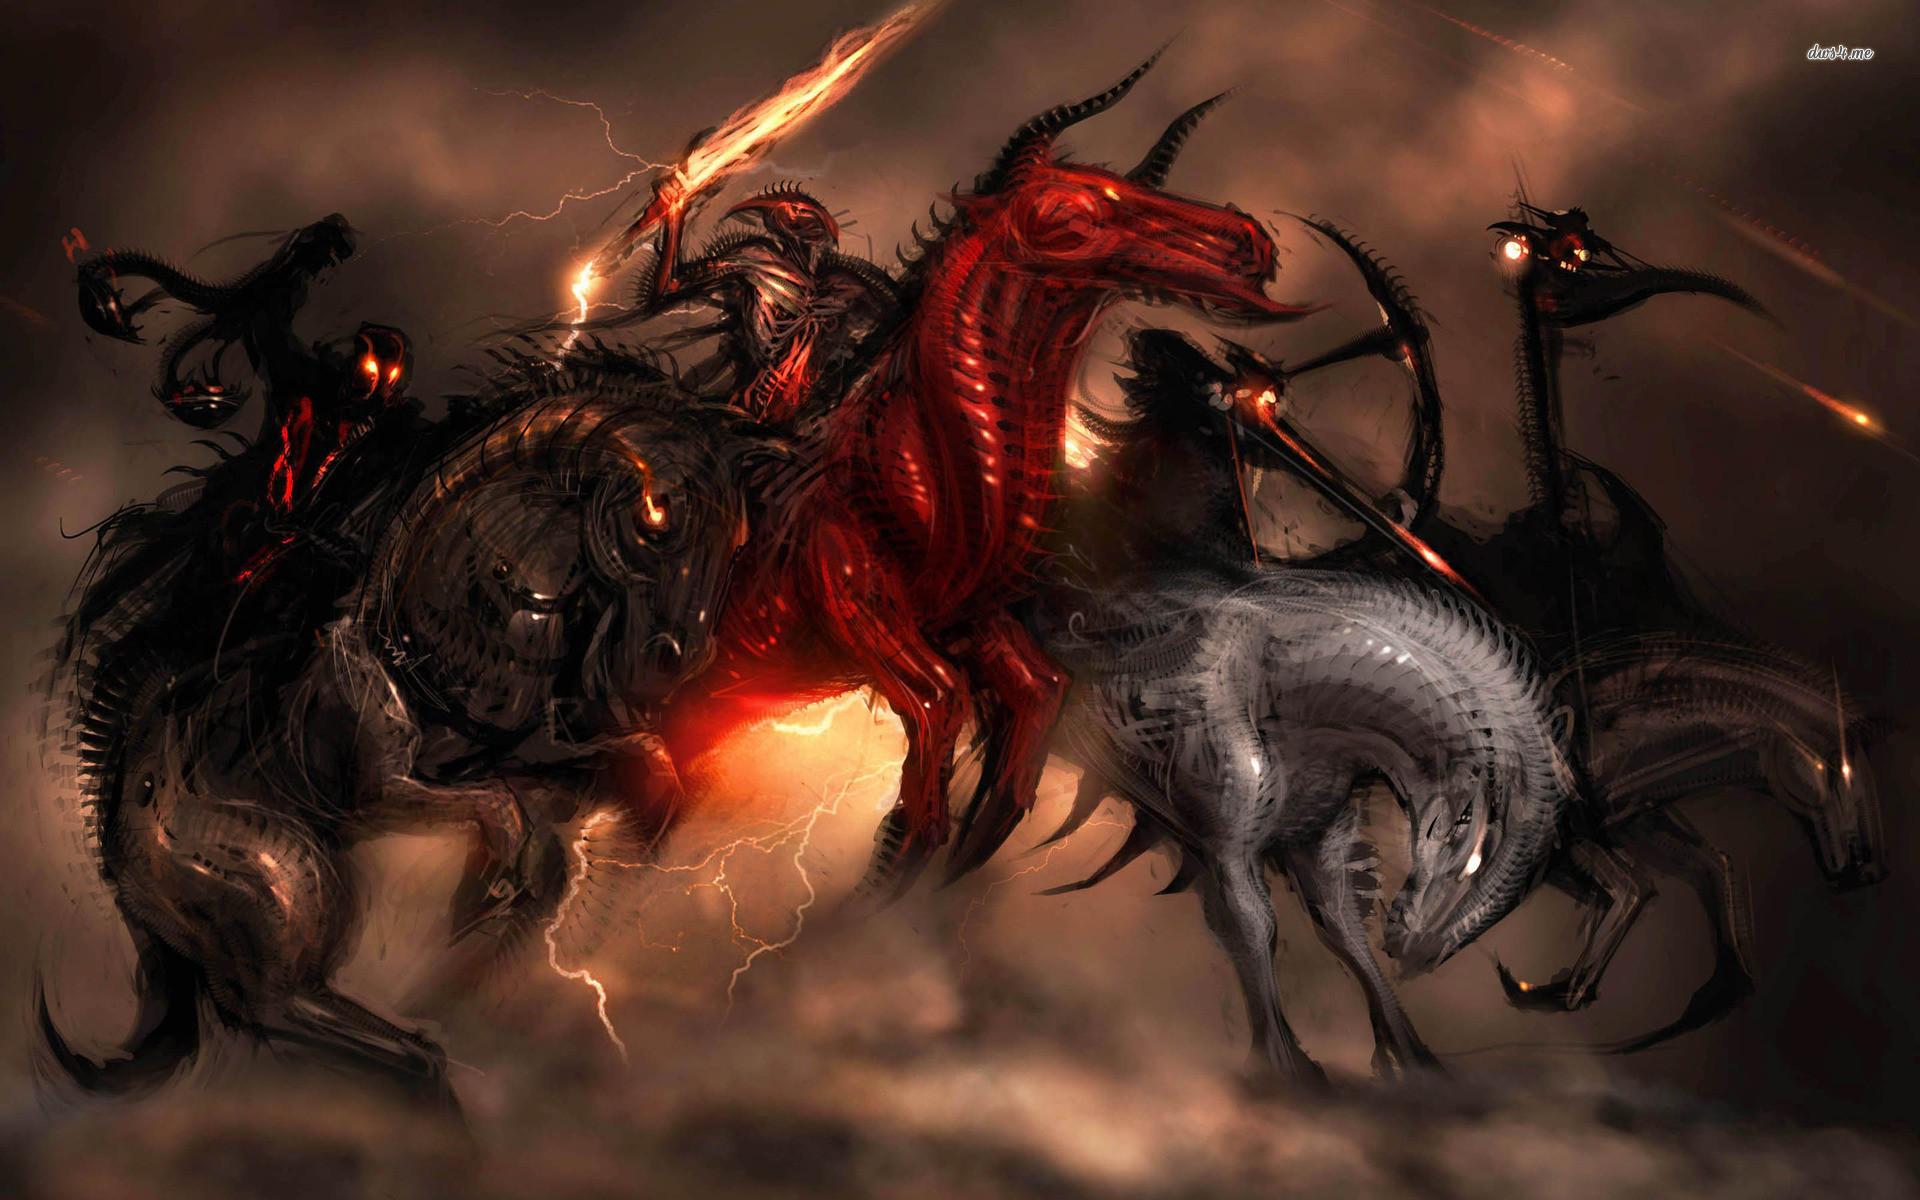 Four Horsemen of the Apocalypse wallpaper – Fantasy wallpapers .